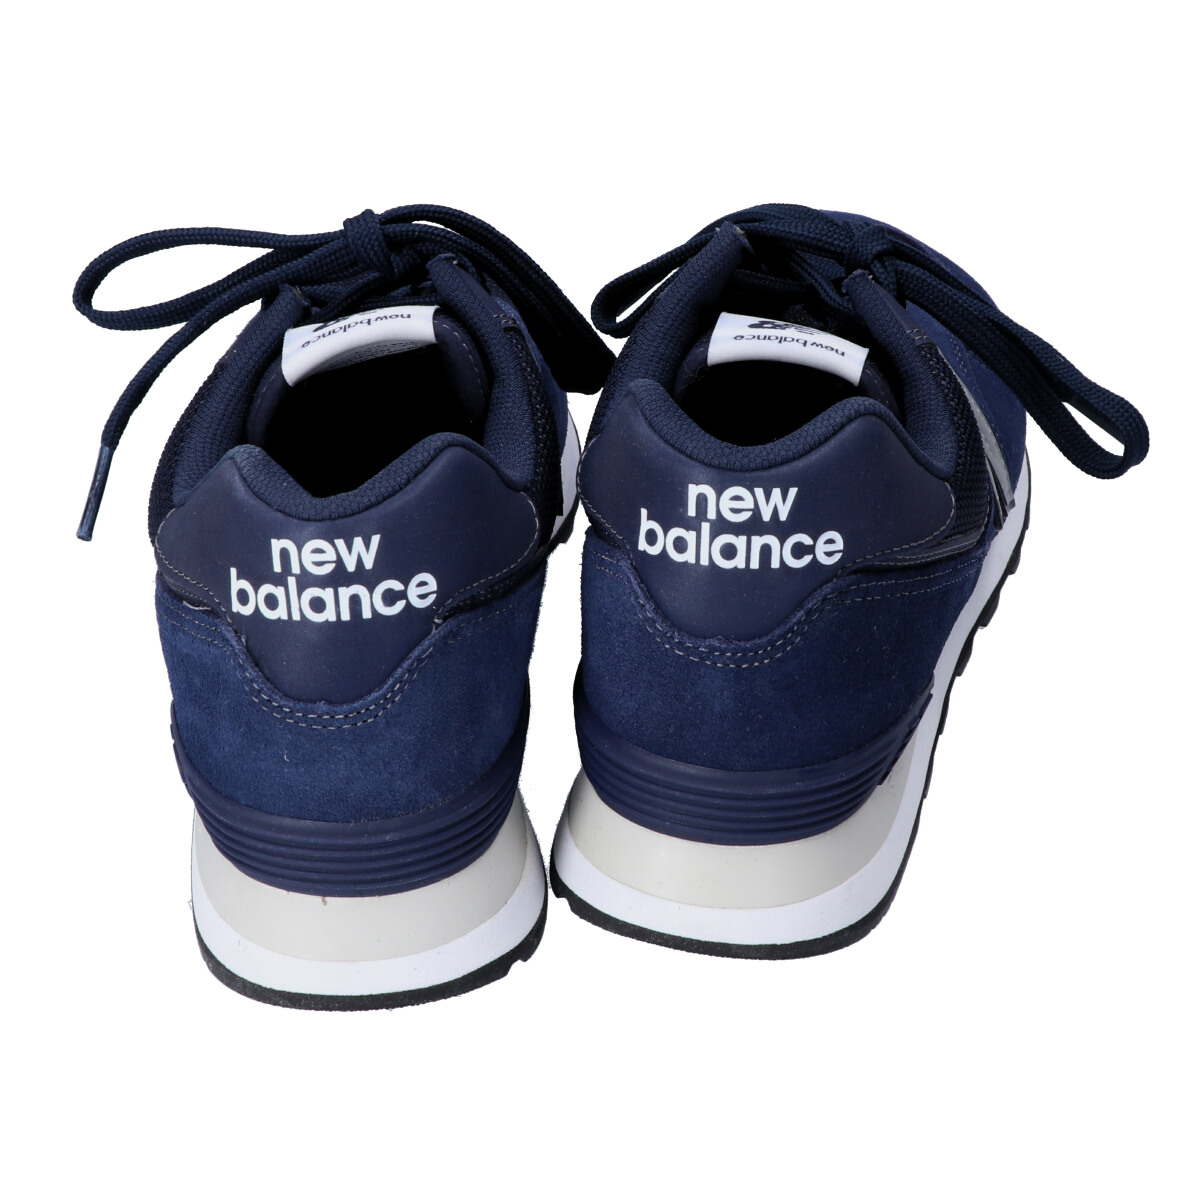 NEW BALANCE New Balance X eYe COMME des GARCONS JUNYA WATANABE MAN ???????????????????? ML574JEN suede mesh sneakers shoes 28cm navy men